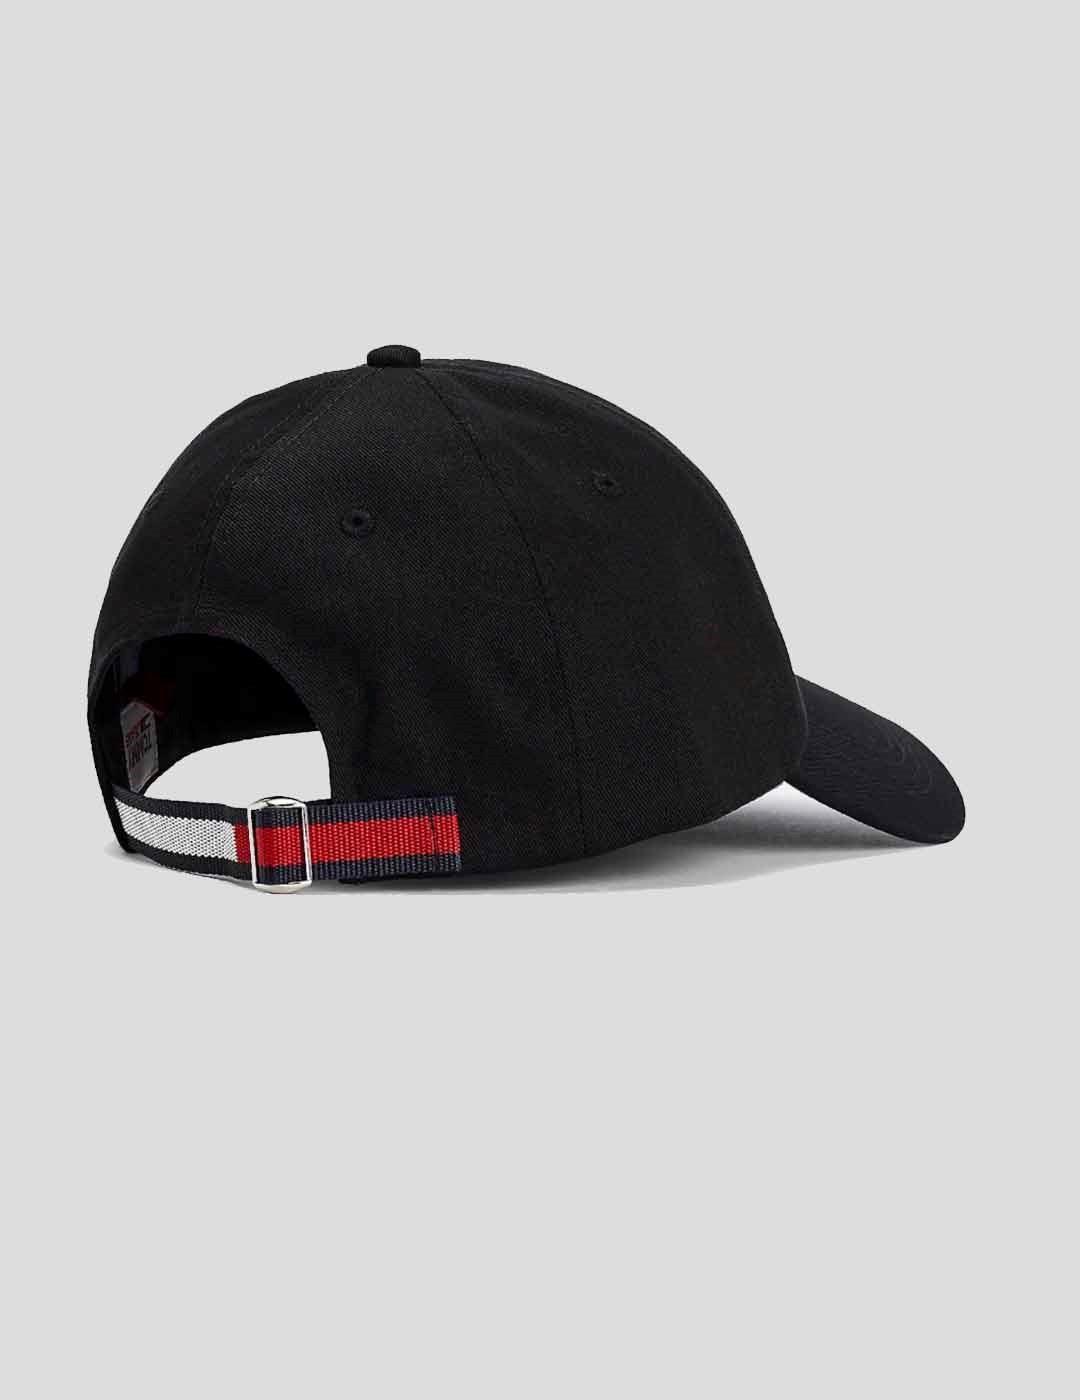 GORRA TOMMY JEANS TJM SPORT CAP BLACK